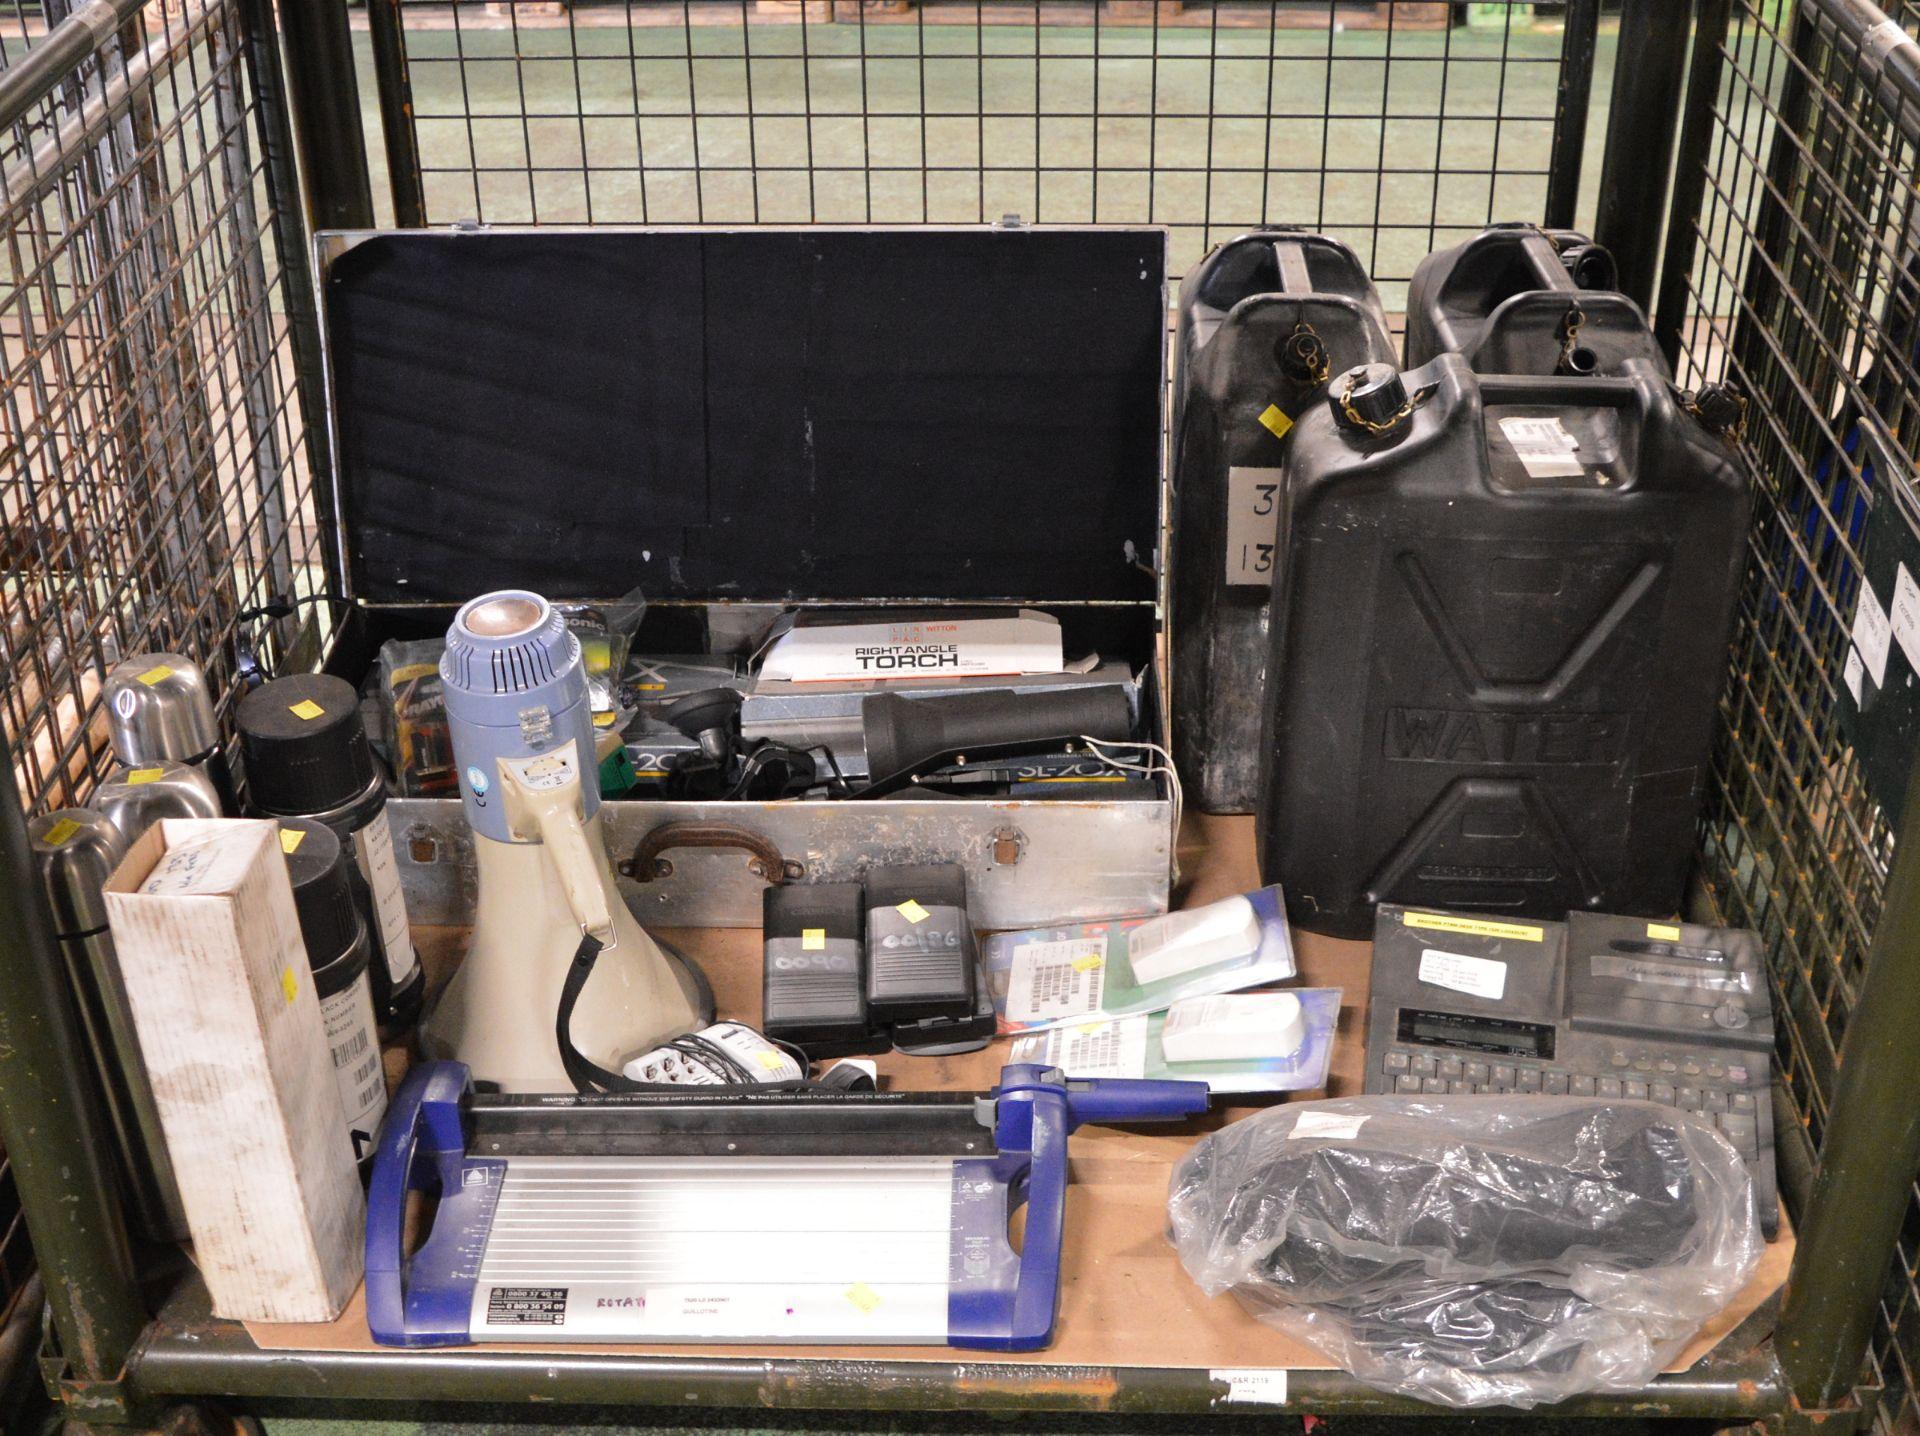 RCD Adaptor Circuit Breaker, 6x Flasks, Domestic Torch, Mirror, Case, Space Heater, Domest